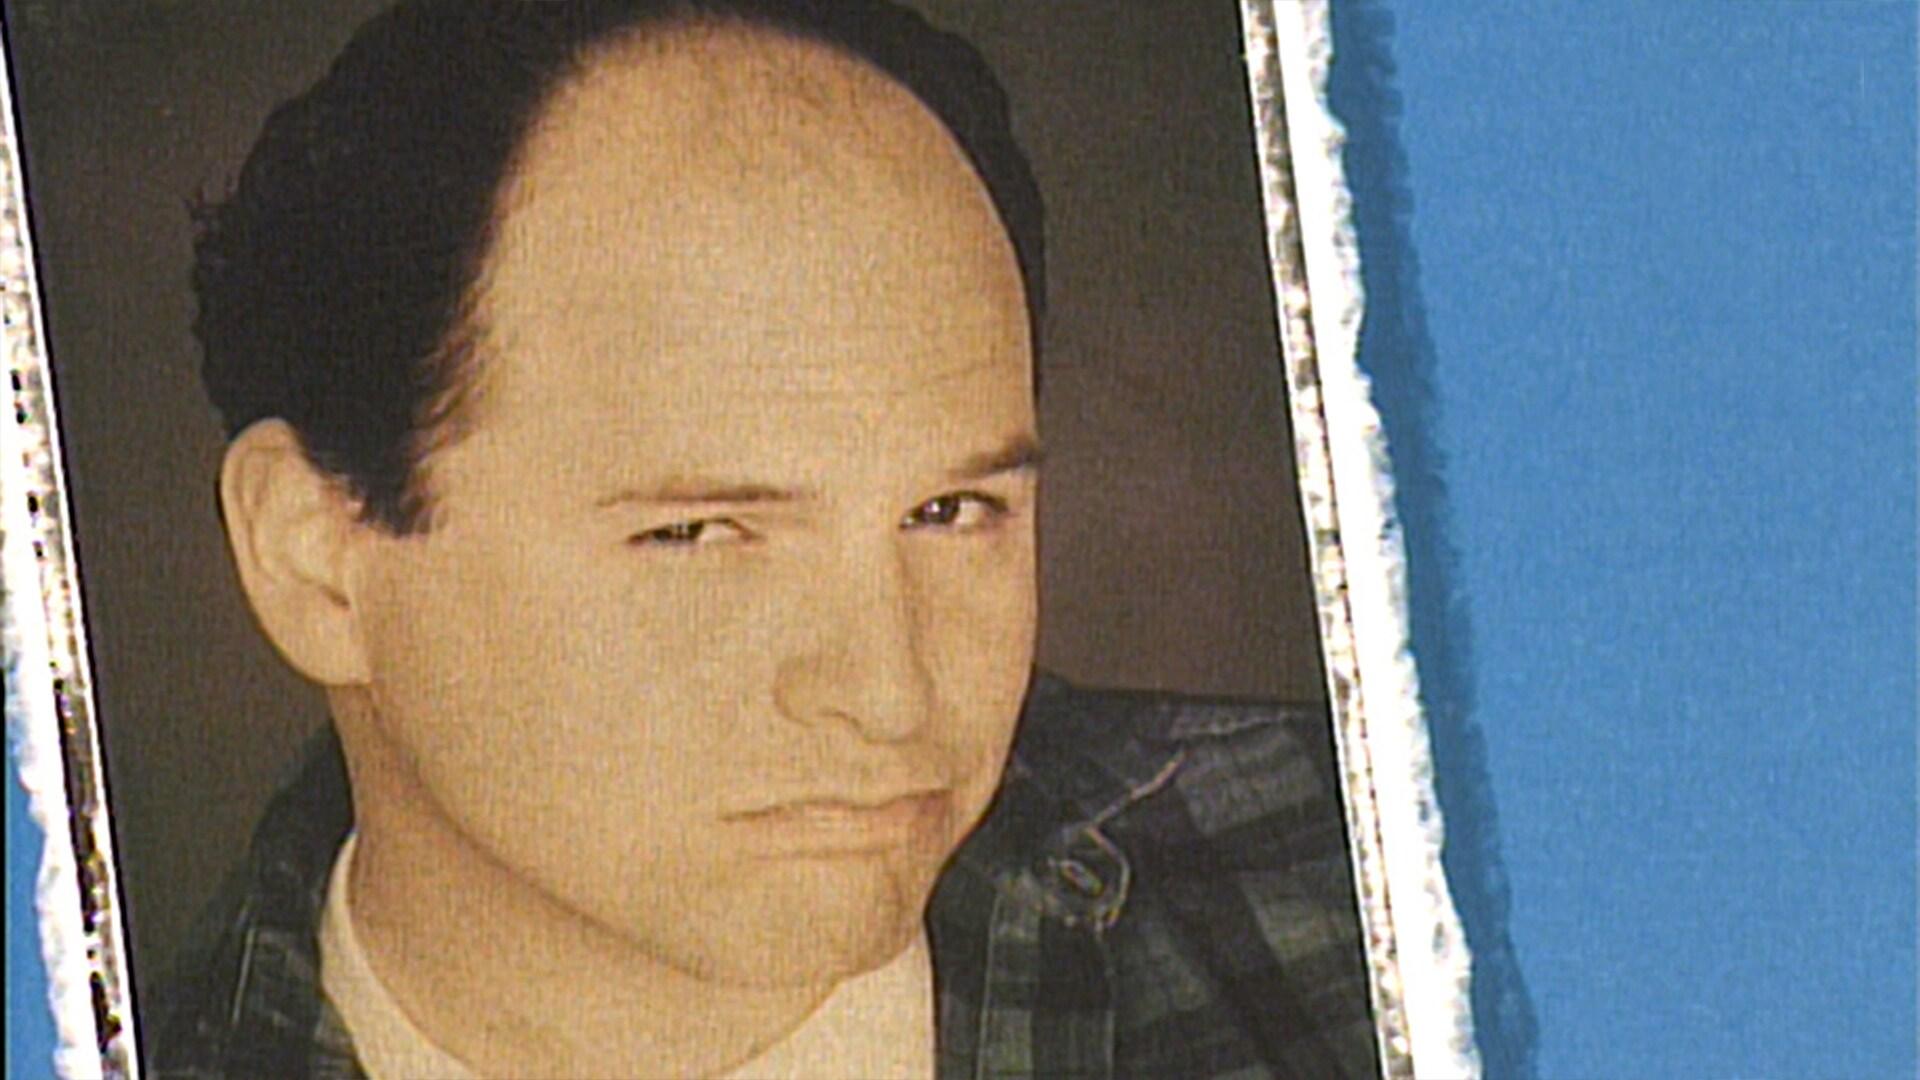 Jason Alexander: April 10, 1993